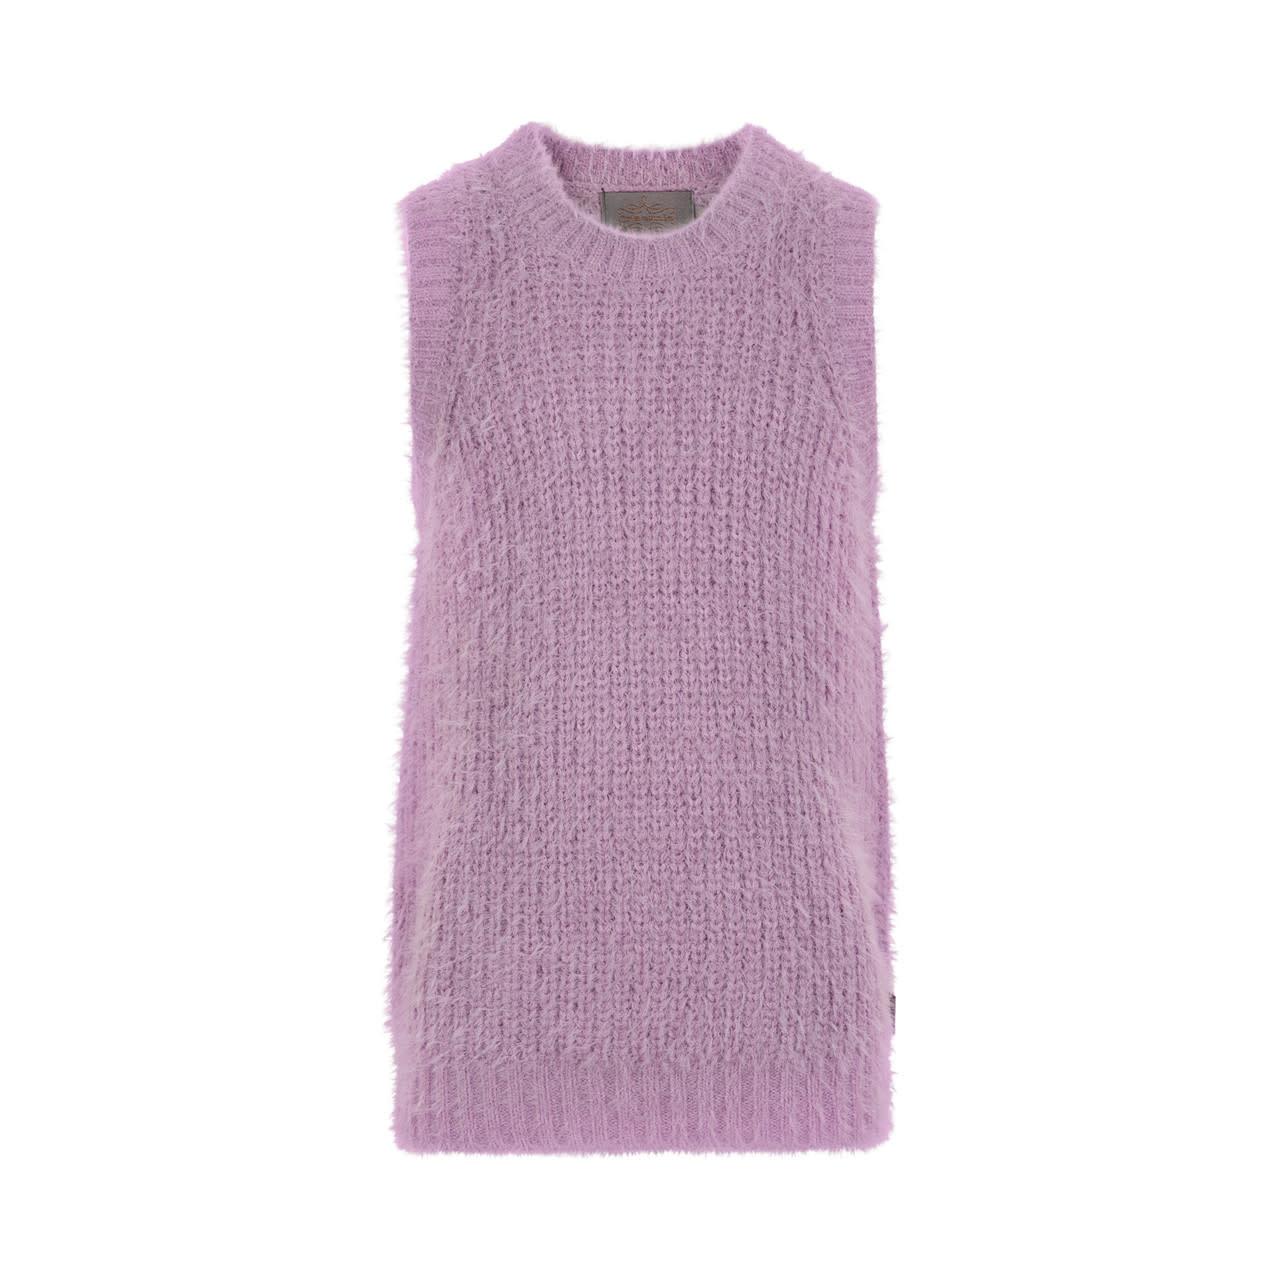 Fluffy Vest - Lavender Mist